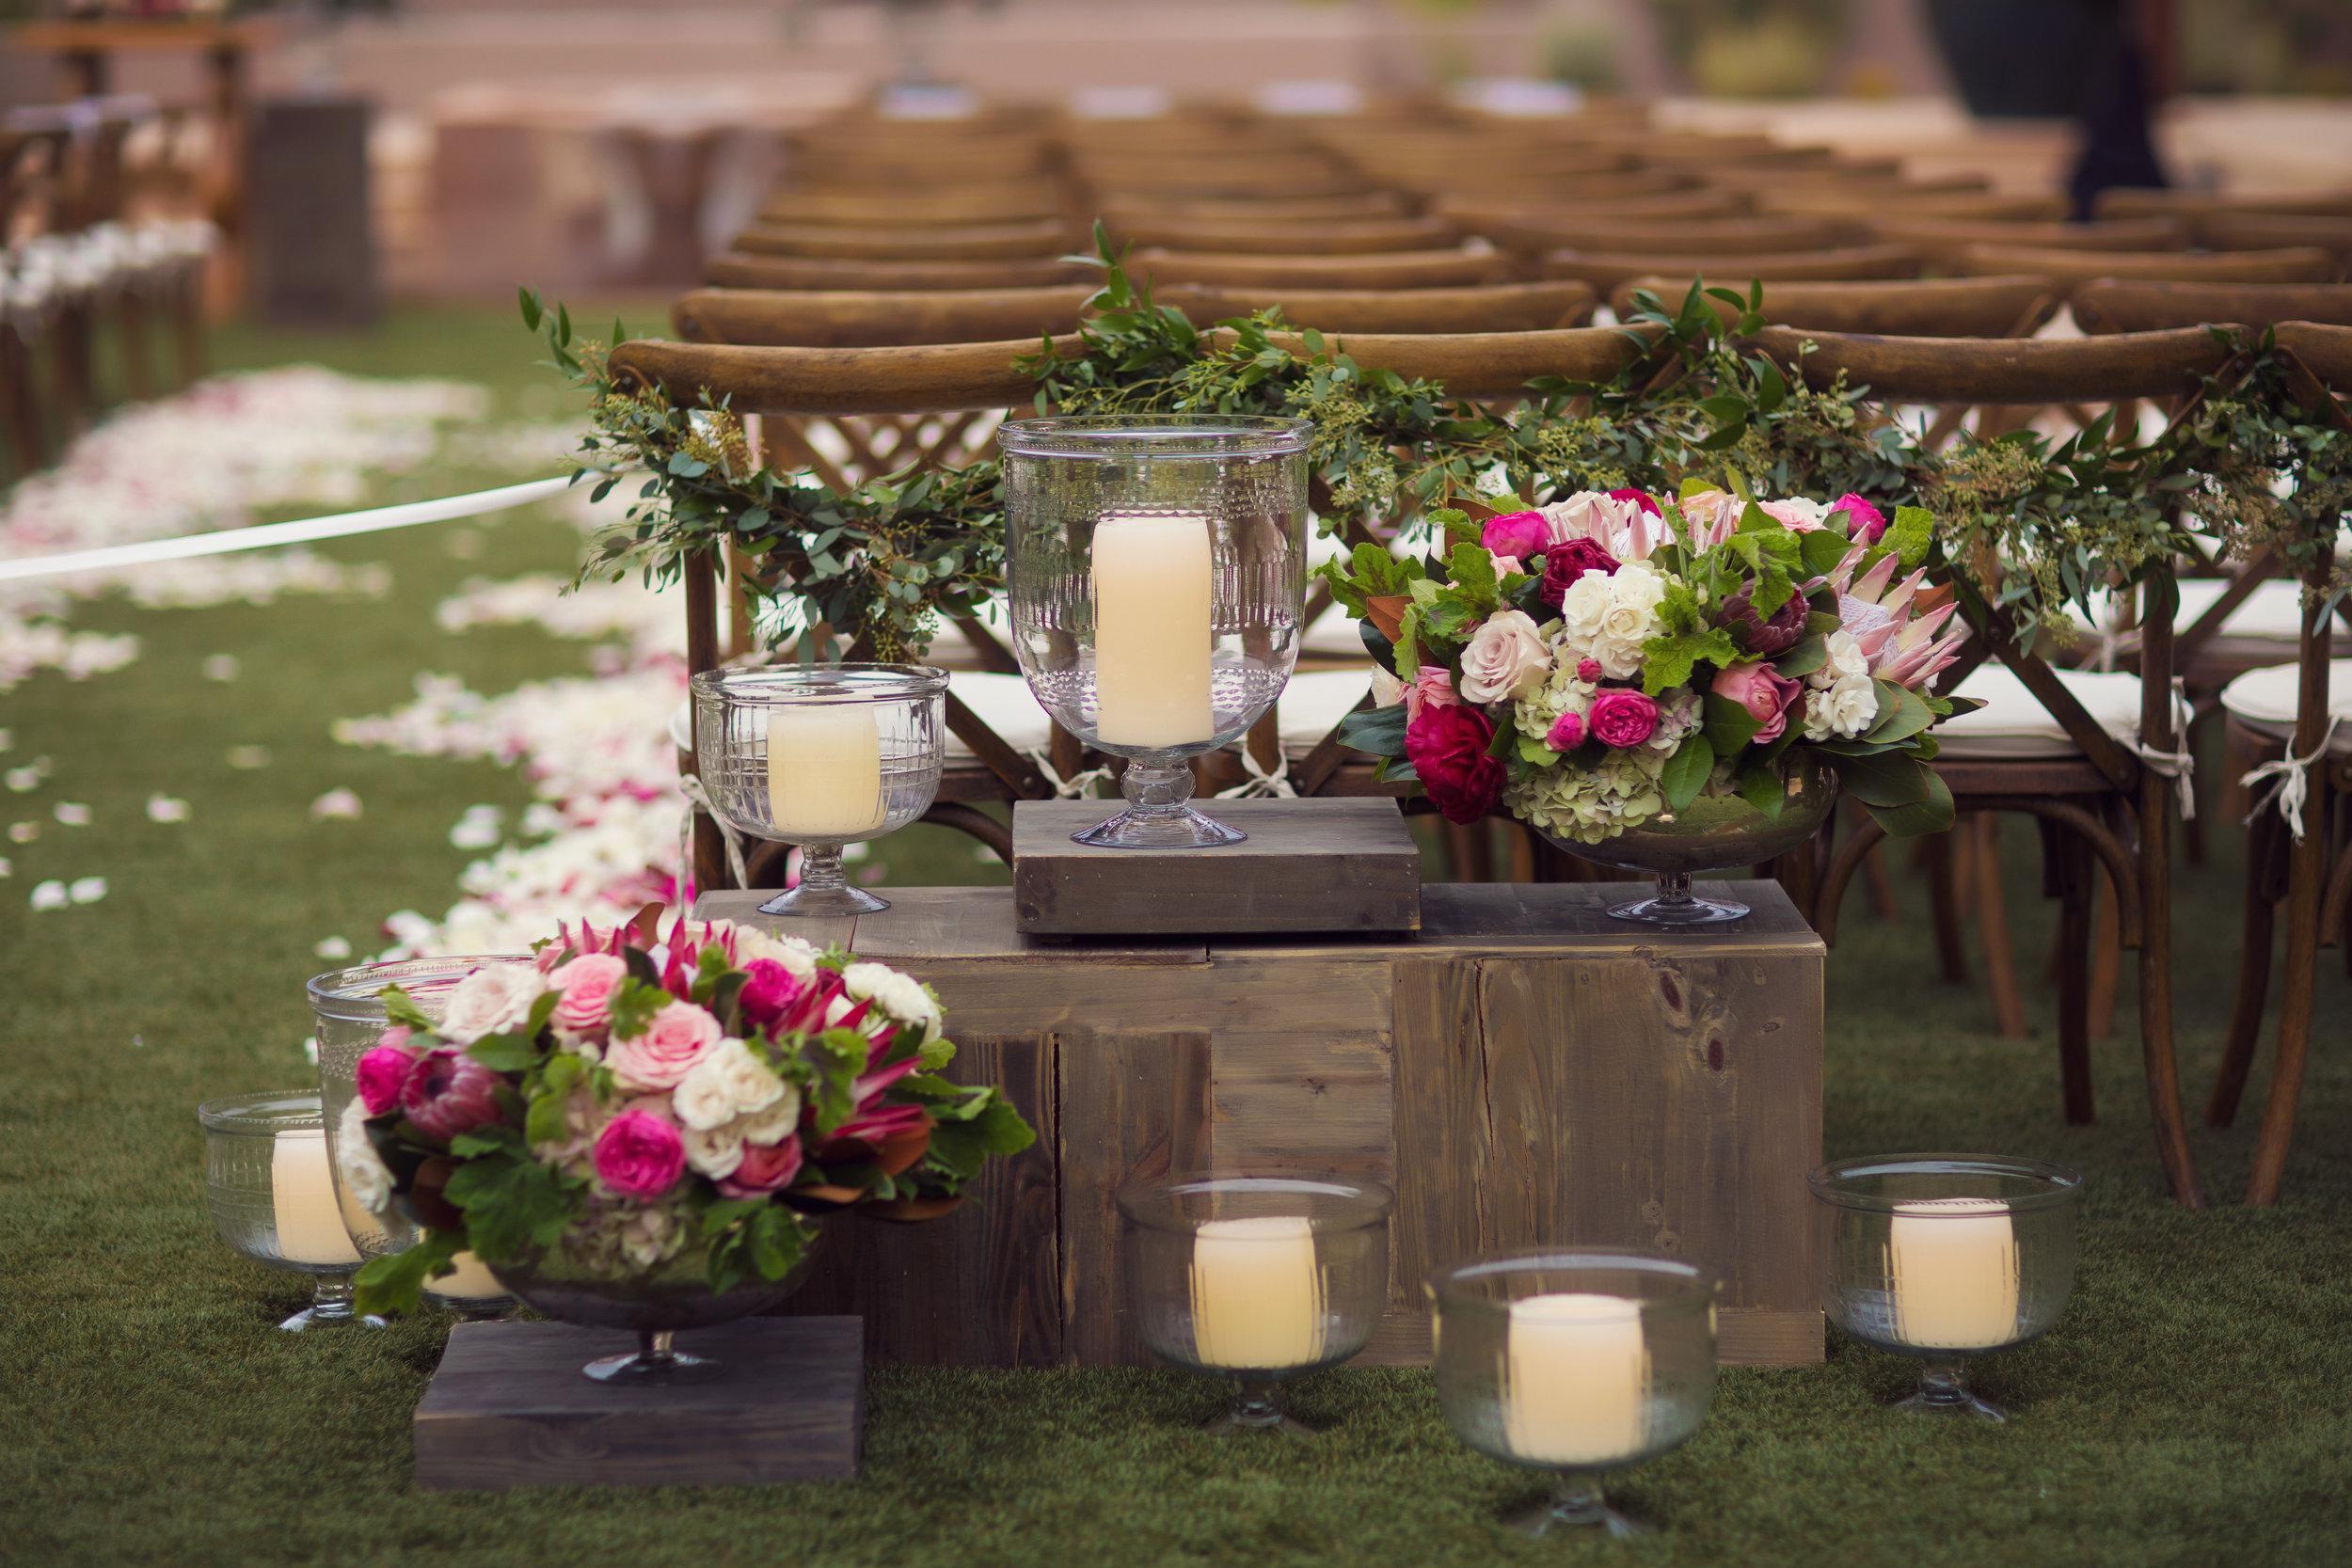 Photos of Makenzie & Matt's Wedding by Trevor Dayley